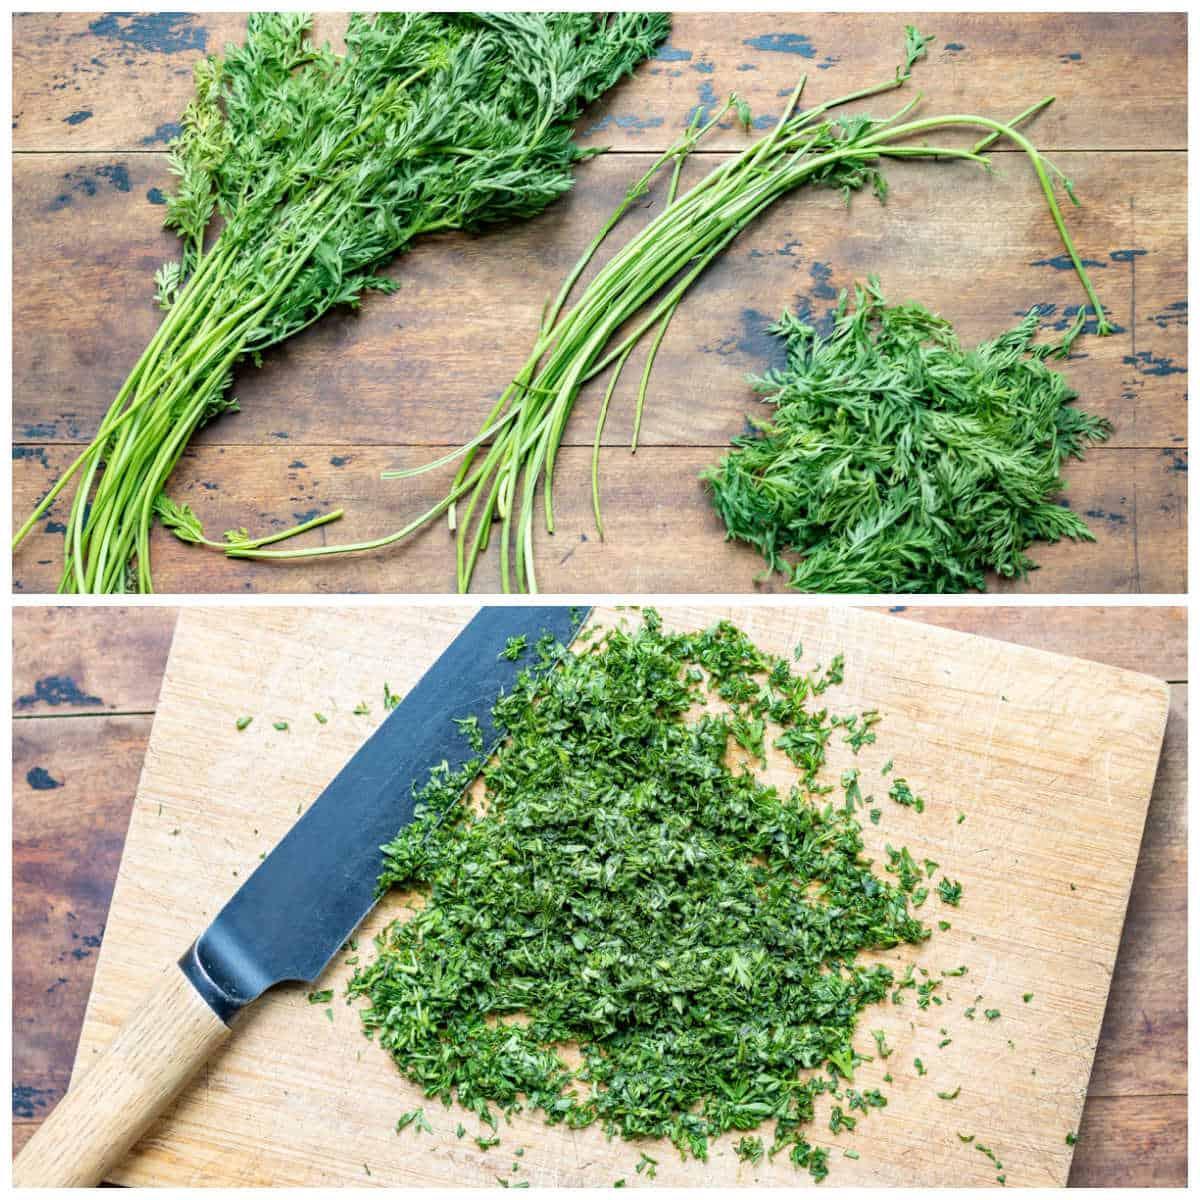 Chopped carrot greens.